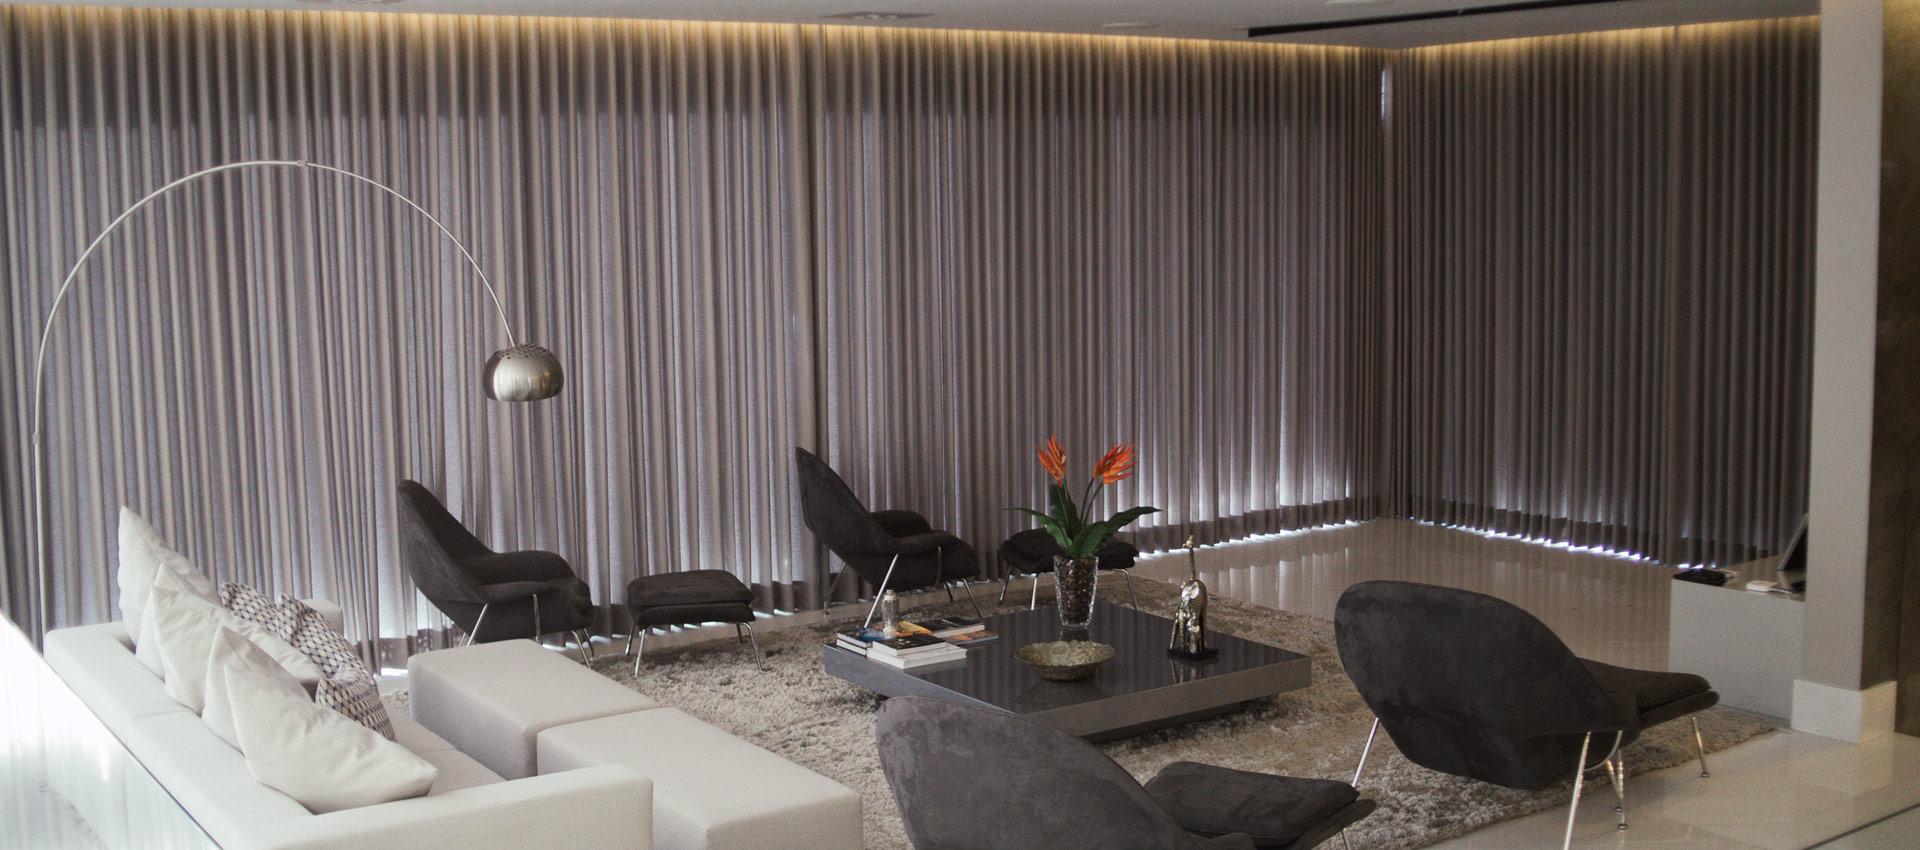 cortina-tecido-02